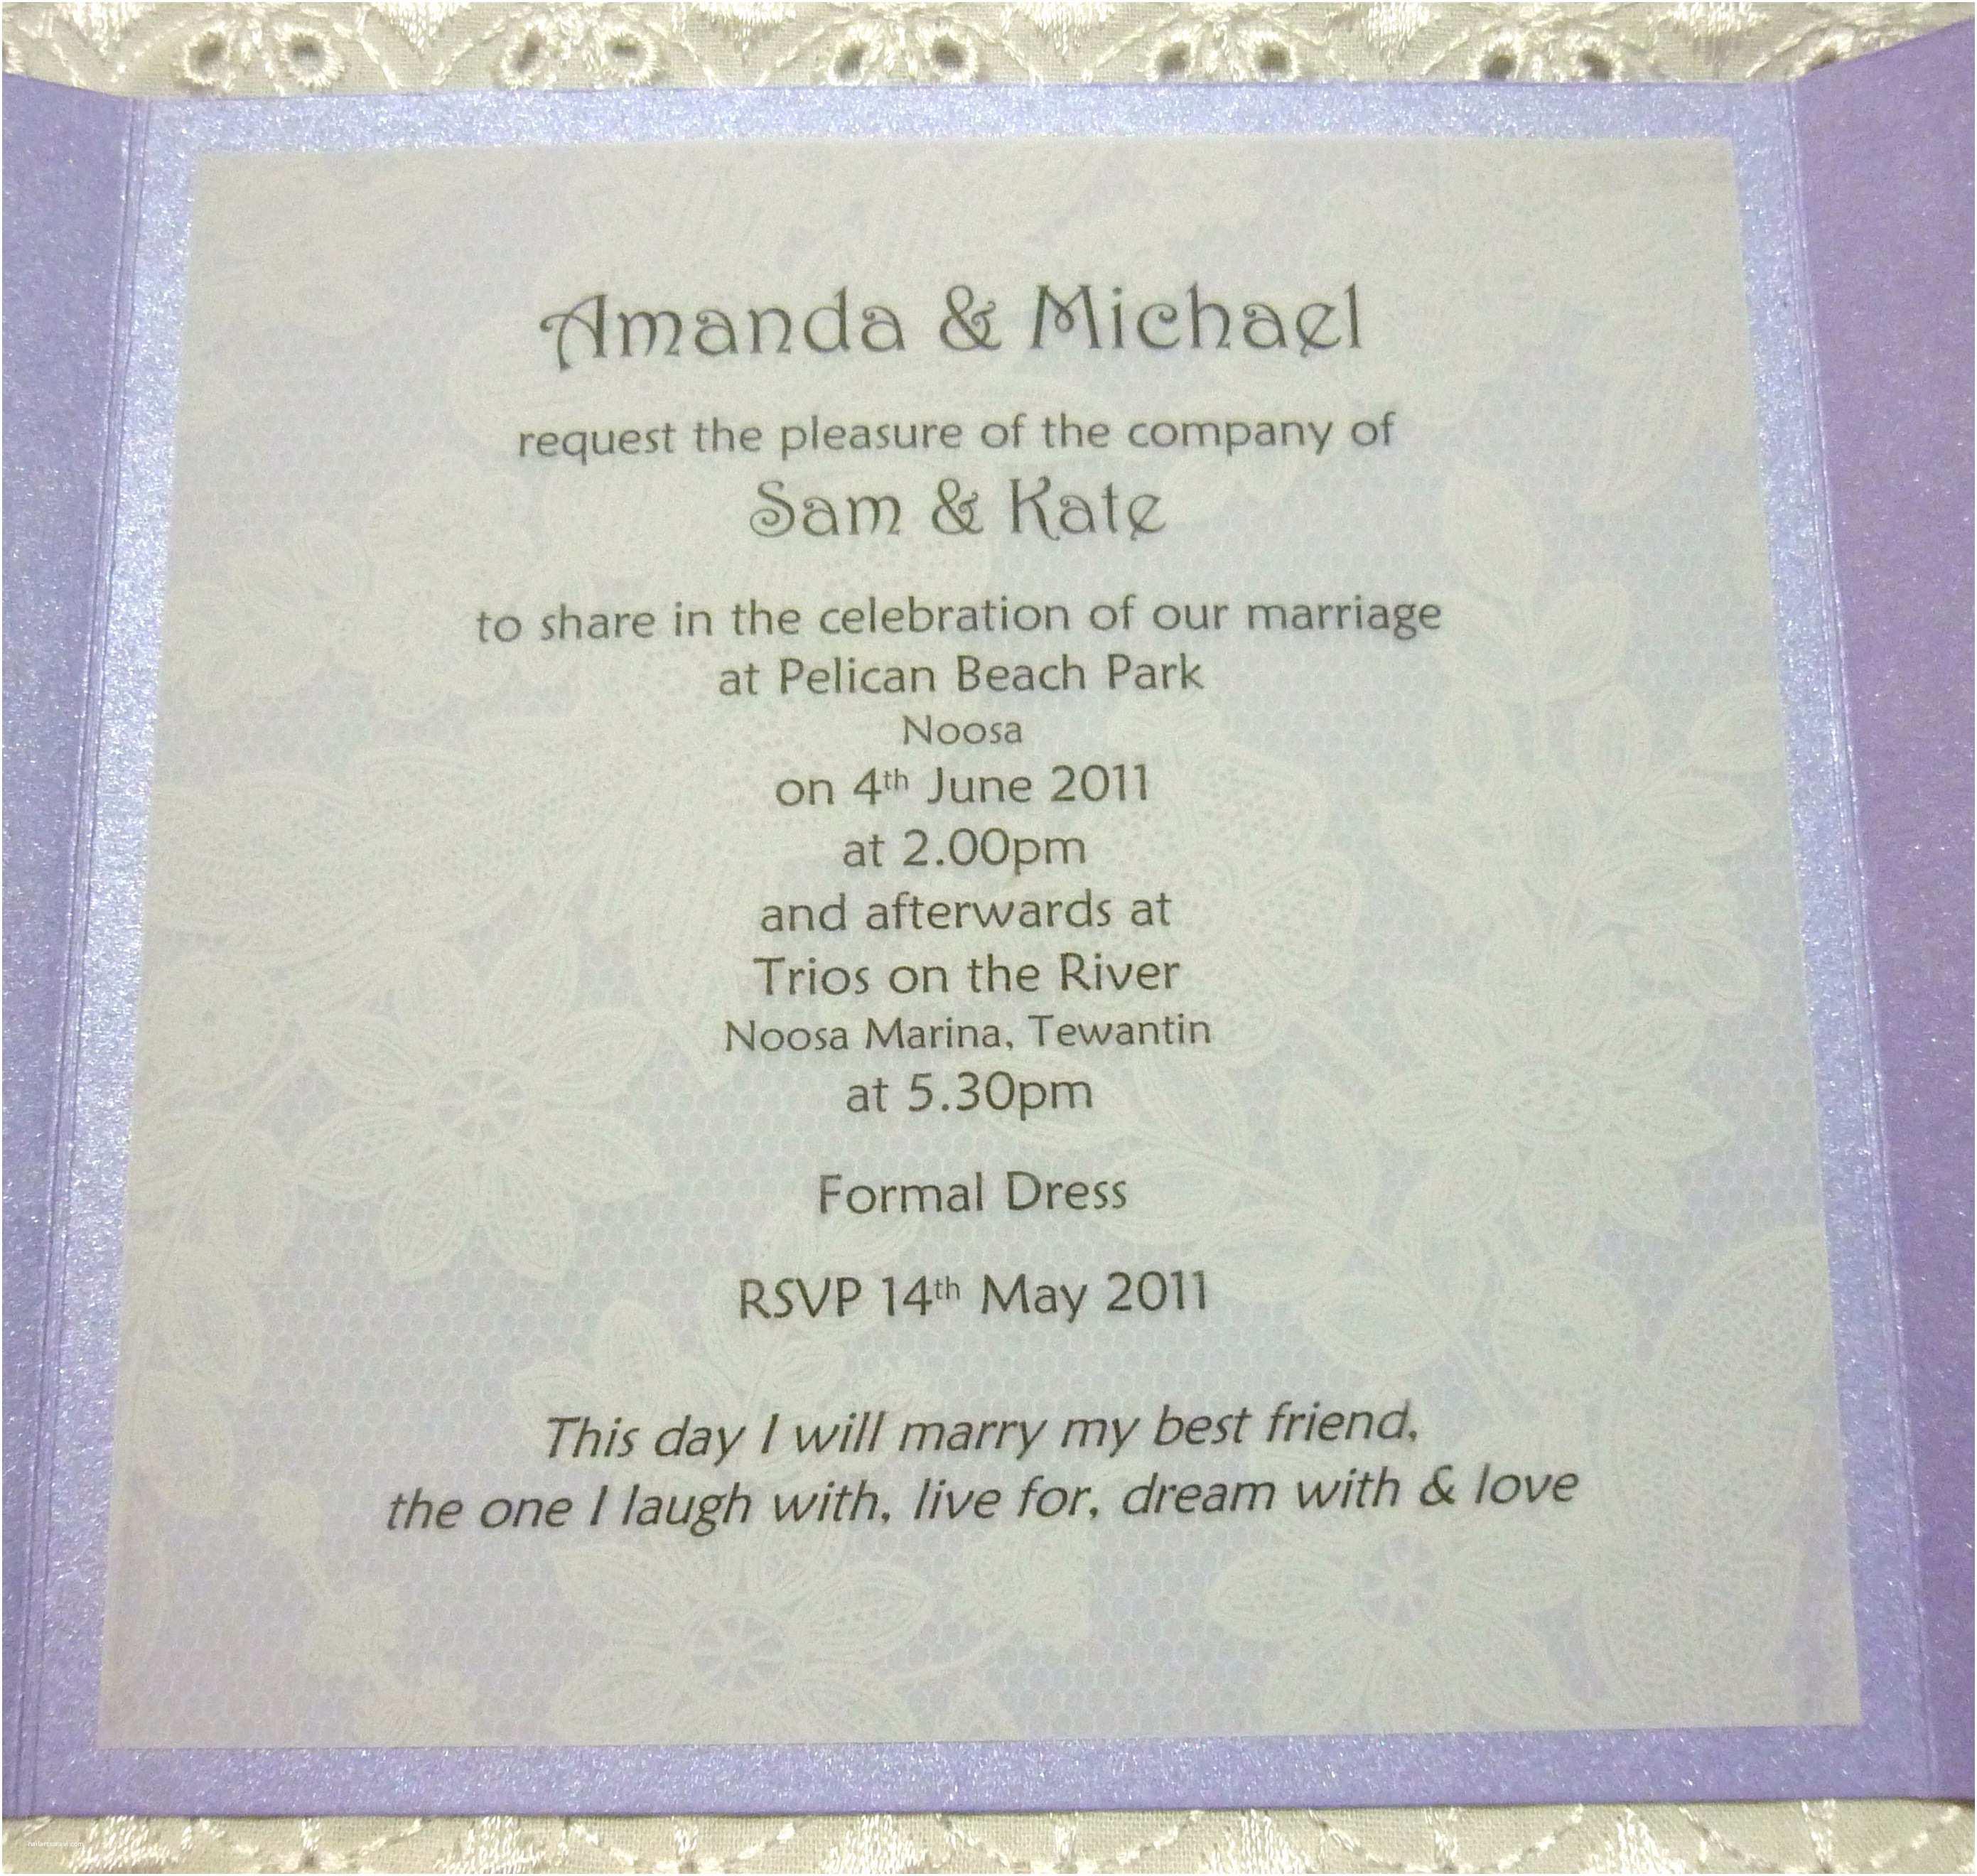 Indian Wedding Invitation Quotes Indian Wedding Invitation Quotes Quotesgram